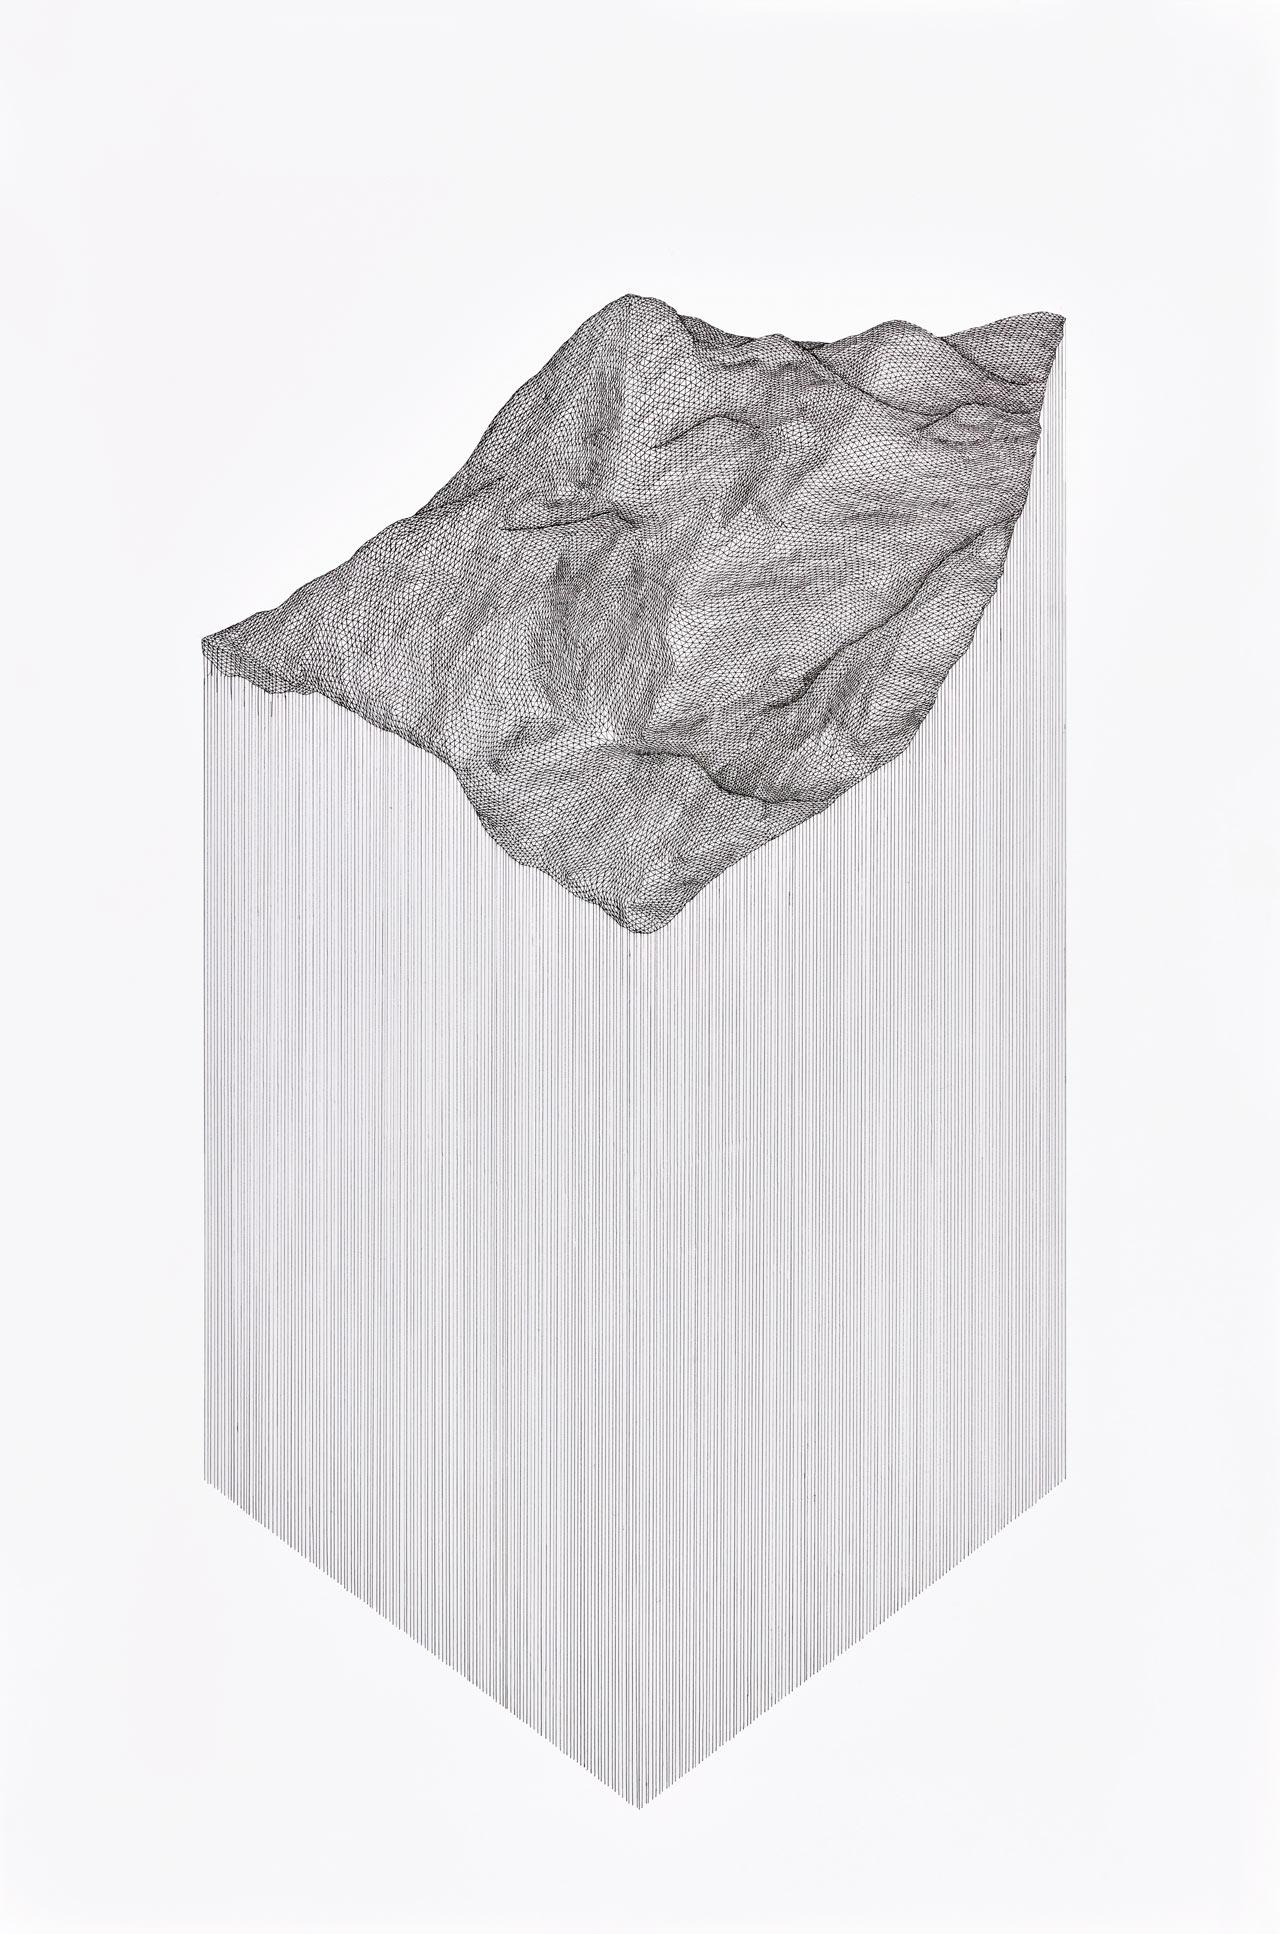 Projected-Terrain-Katy-Ann-Gilmore